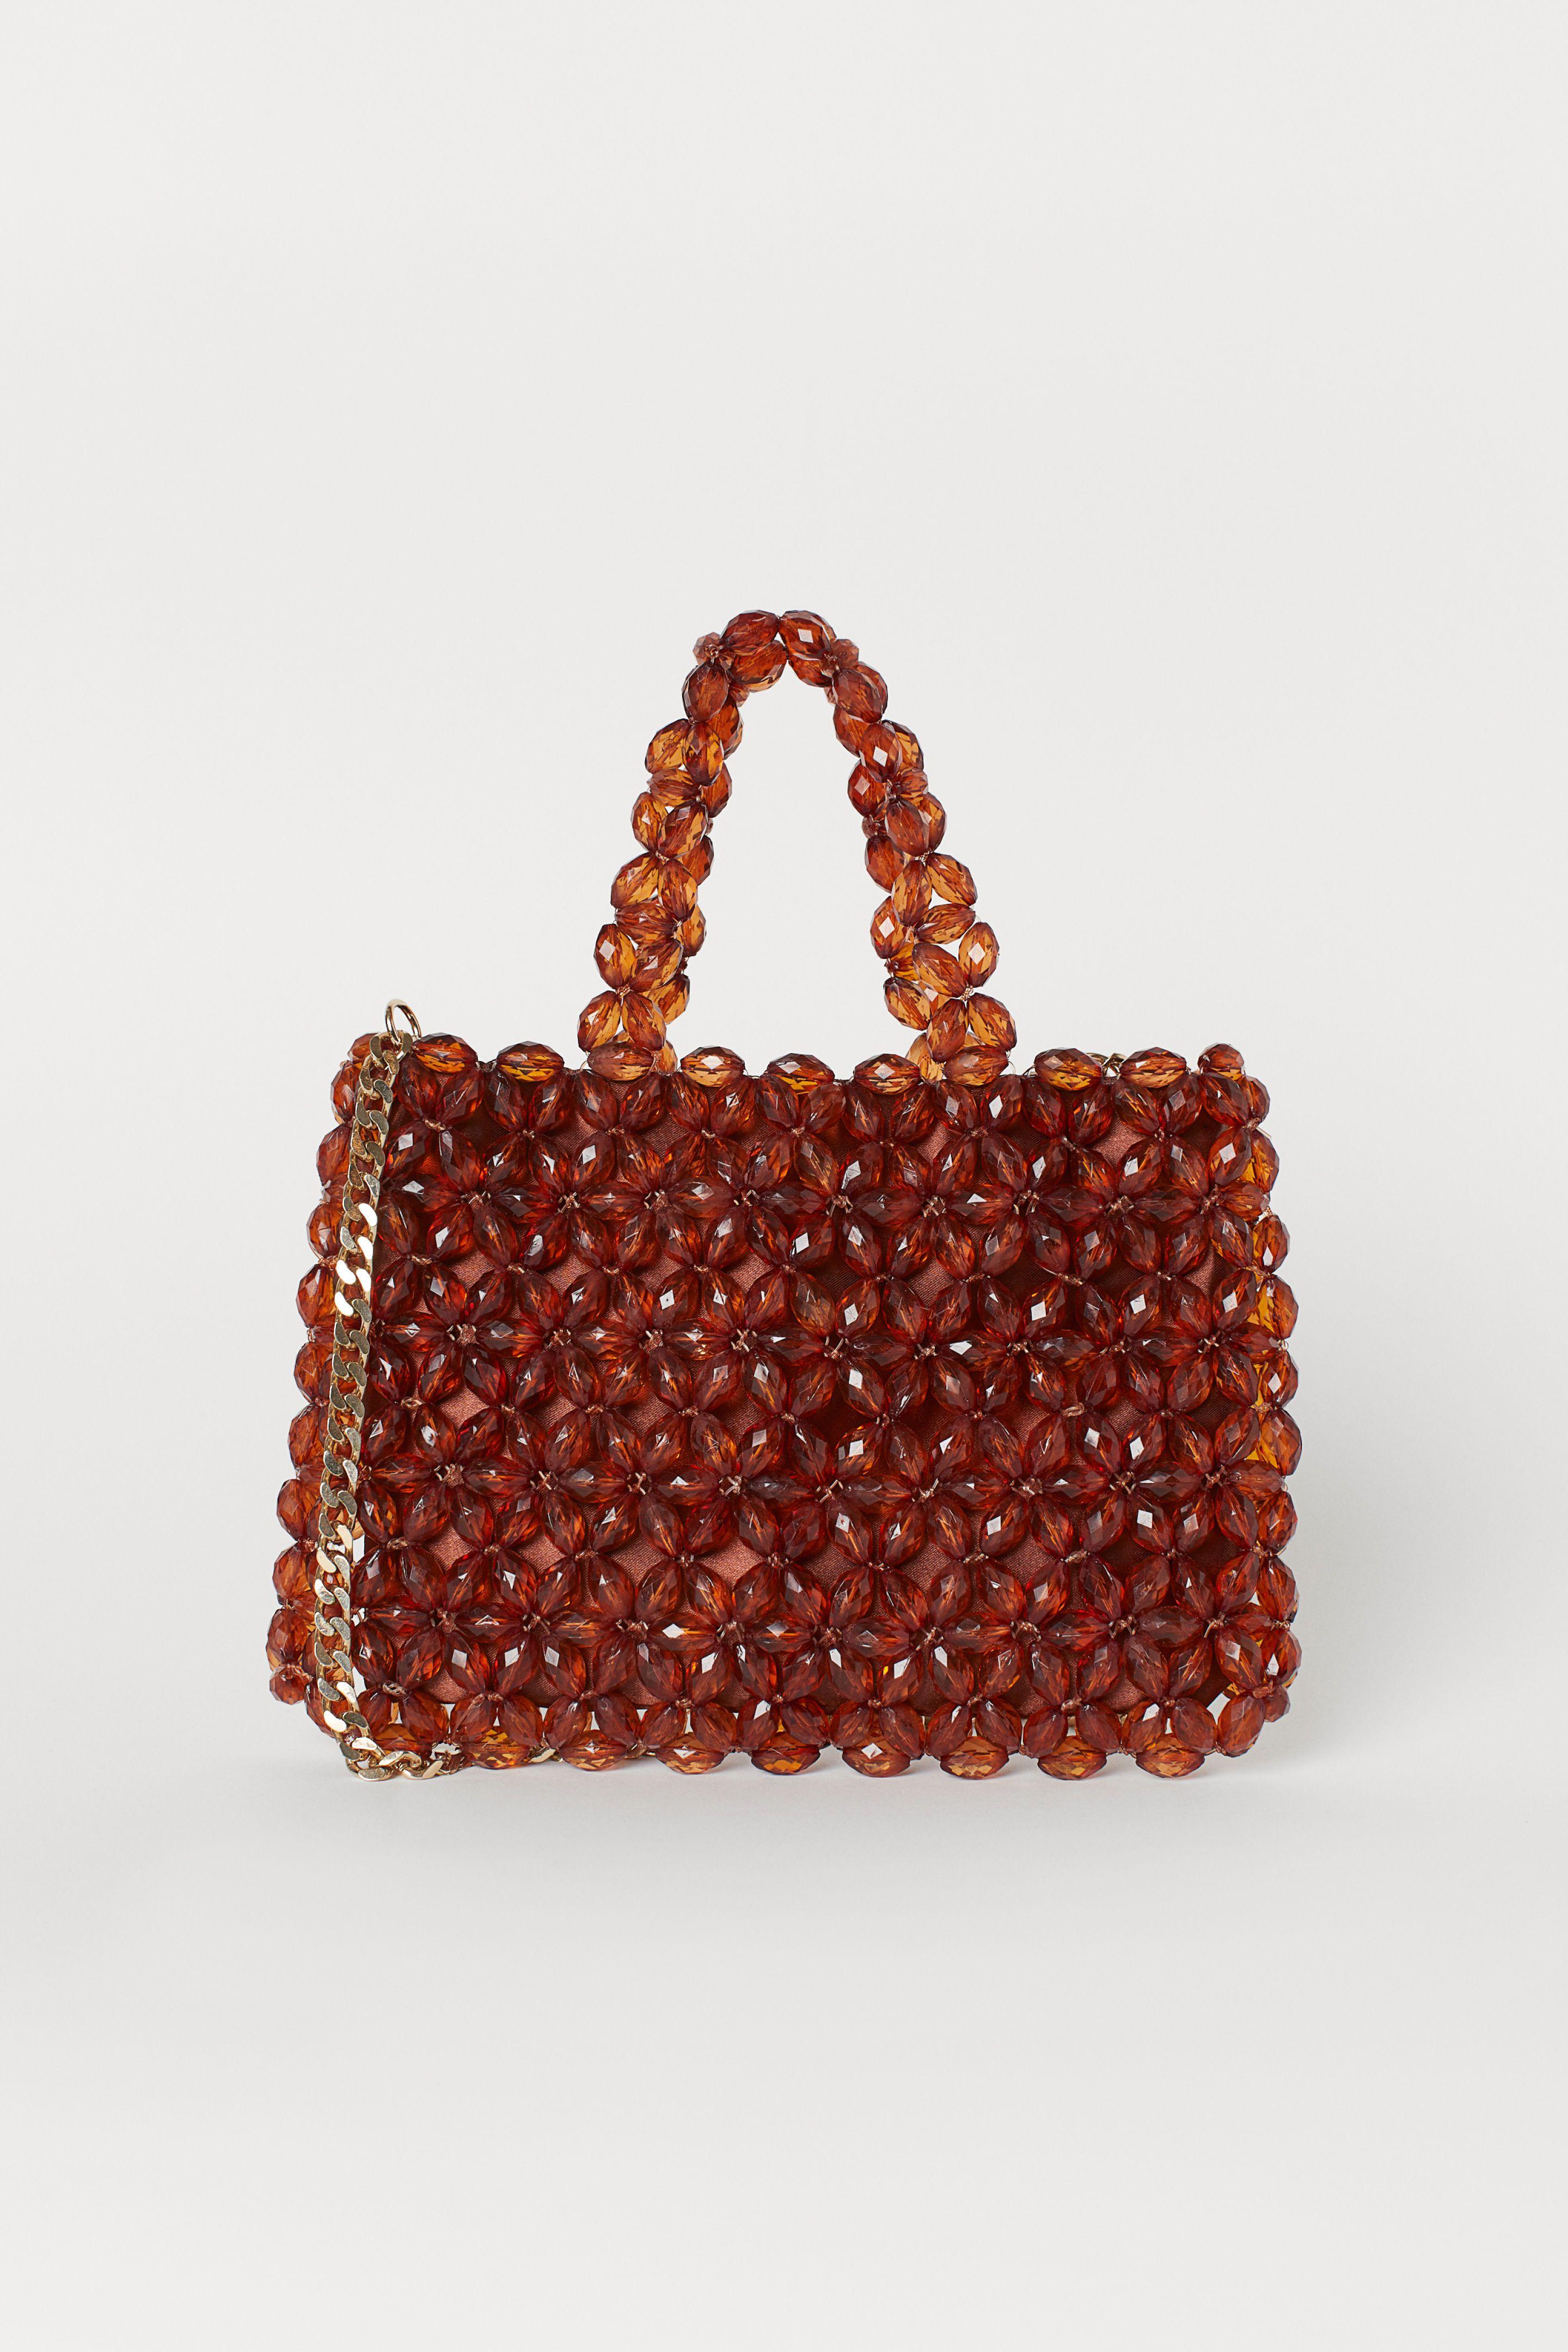 bead embroidered handbag H&M